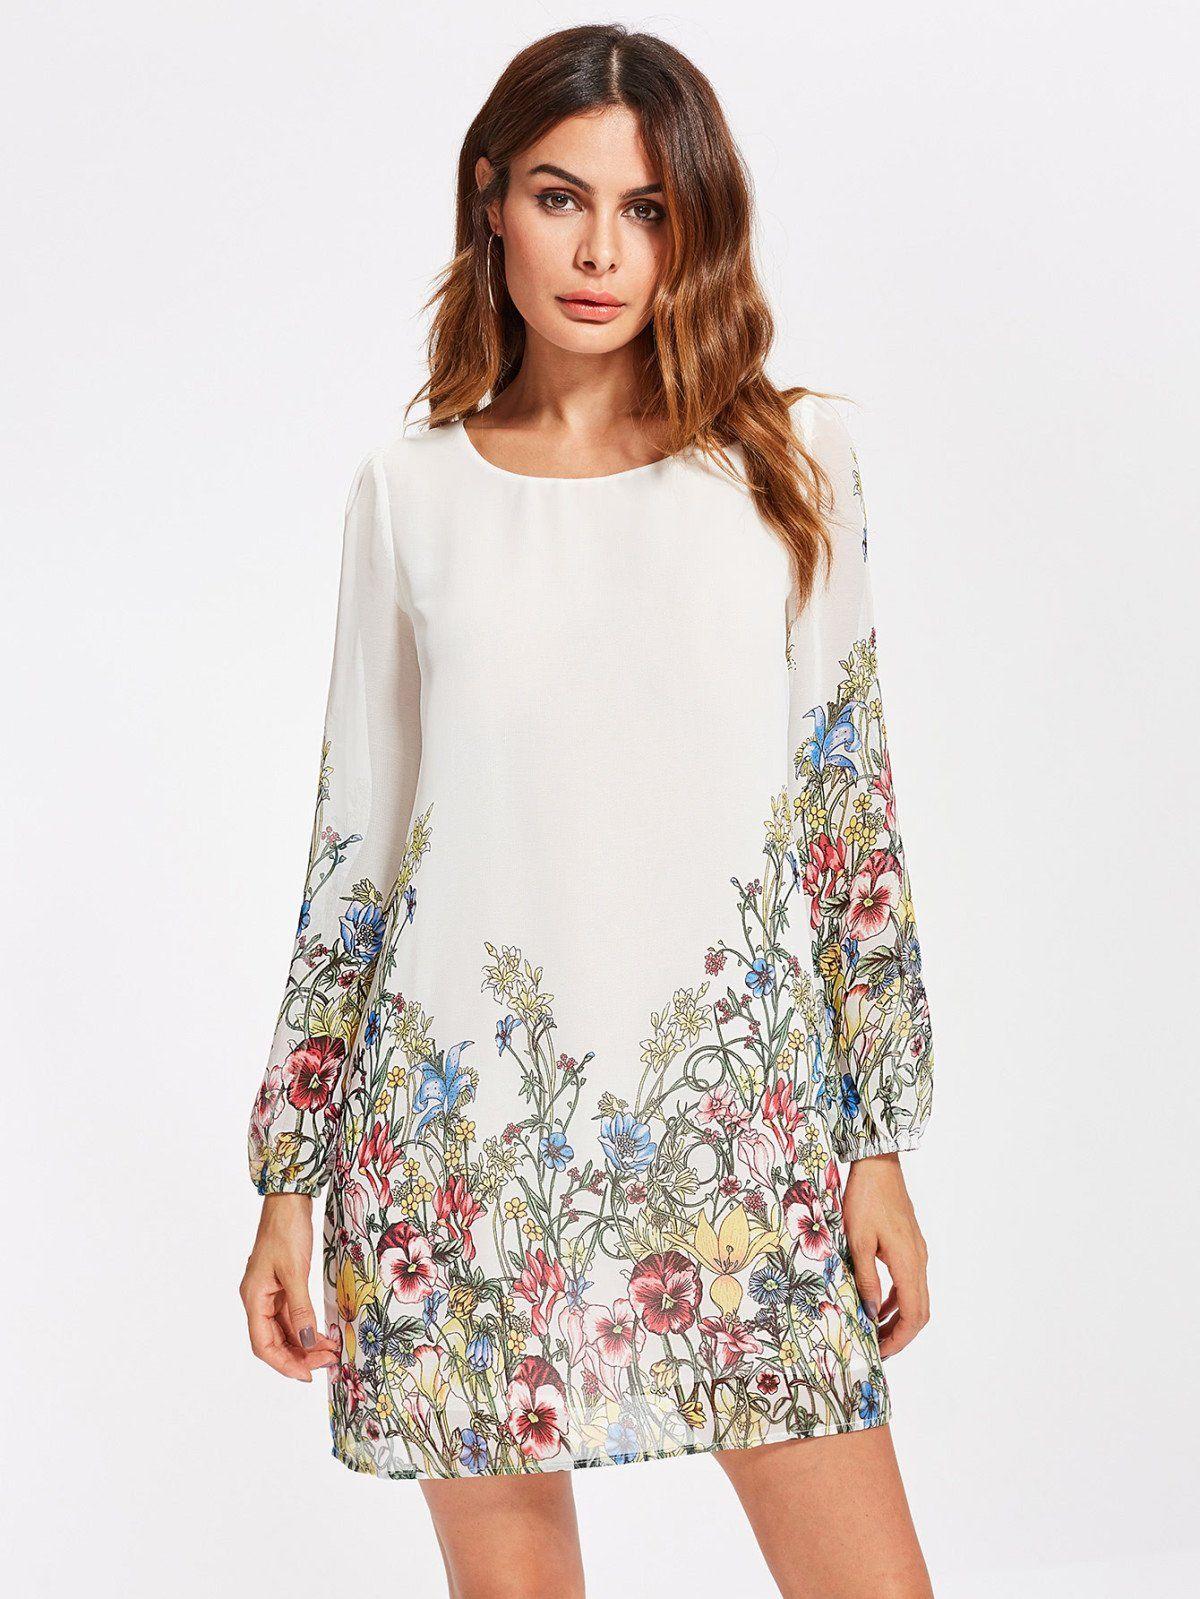 49b172656a Dresses by borntowear botanical print tunic dress dresses